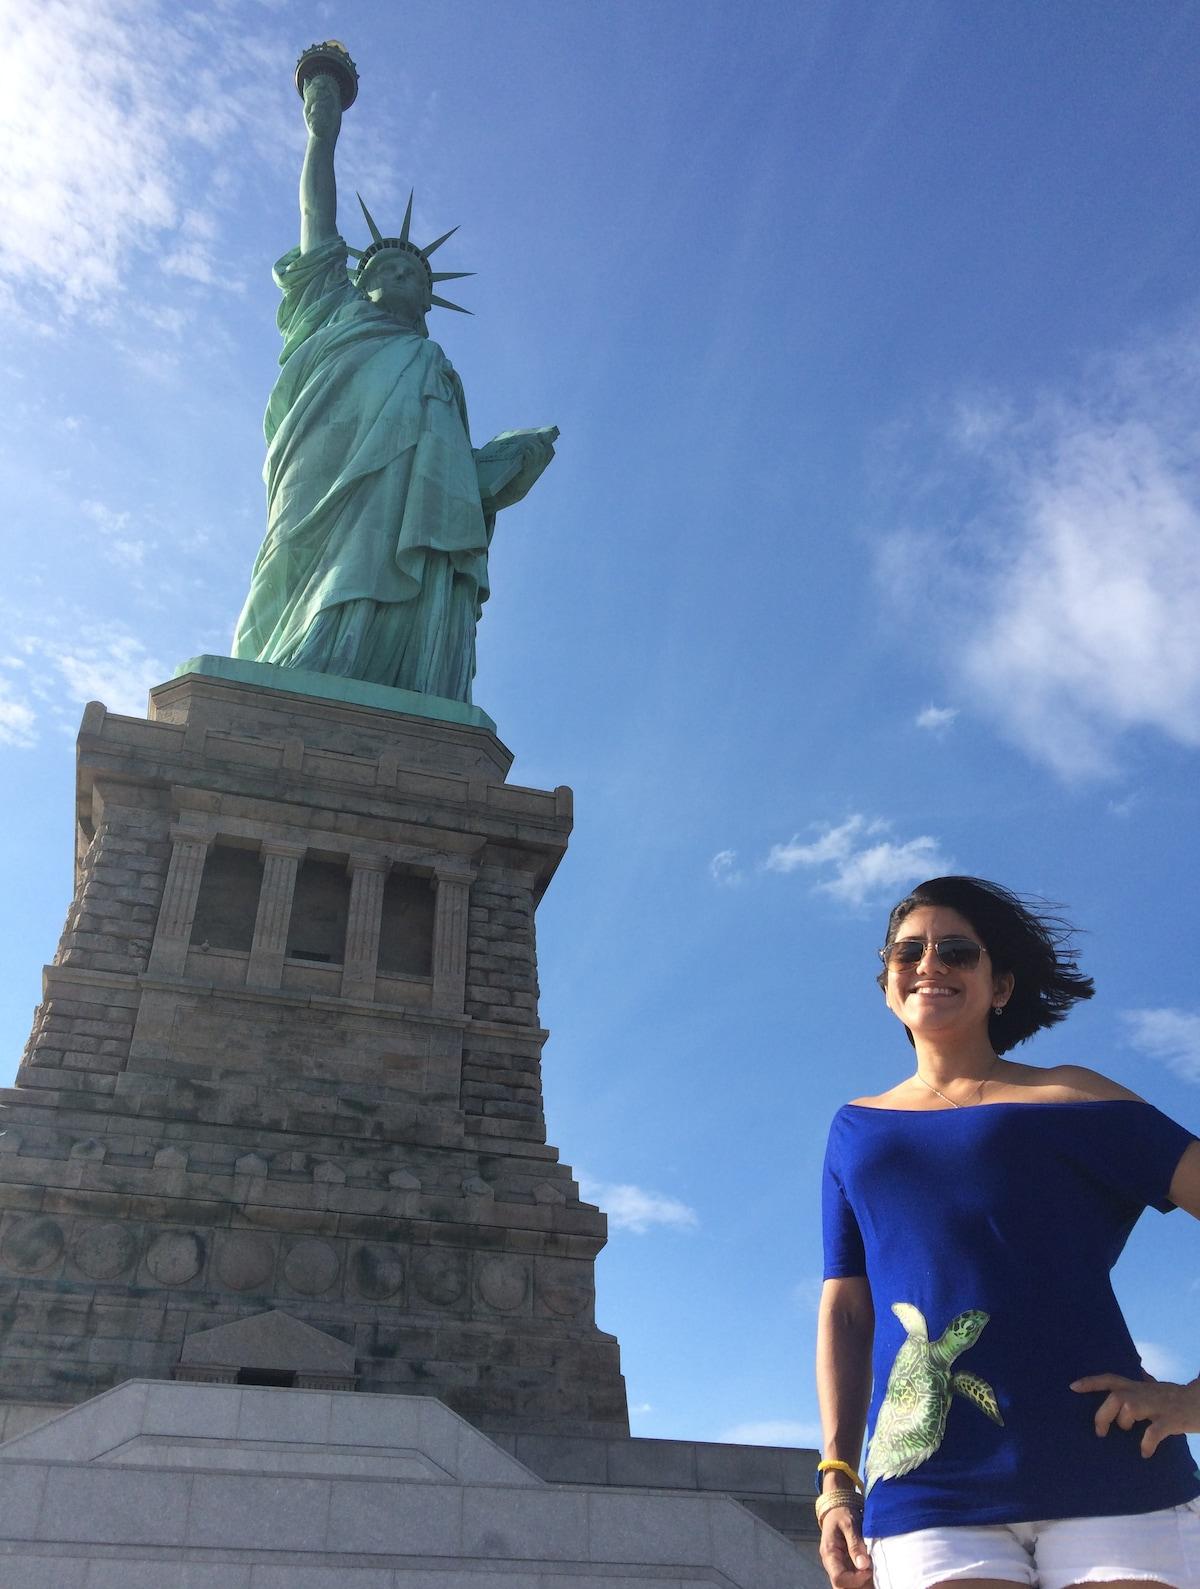 Monica from New York